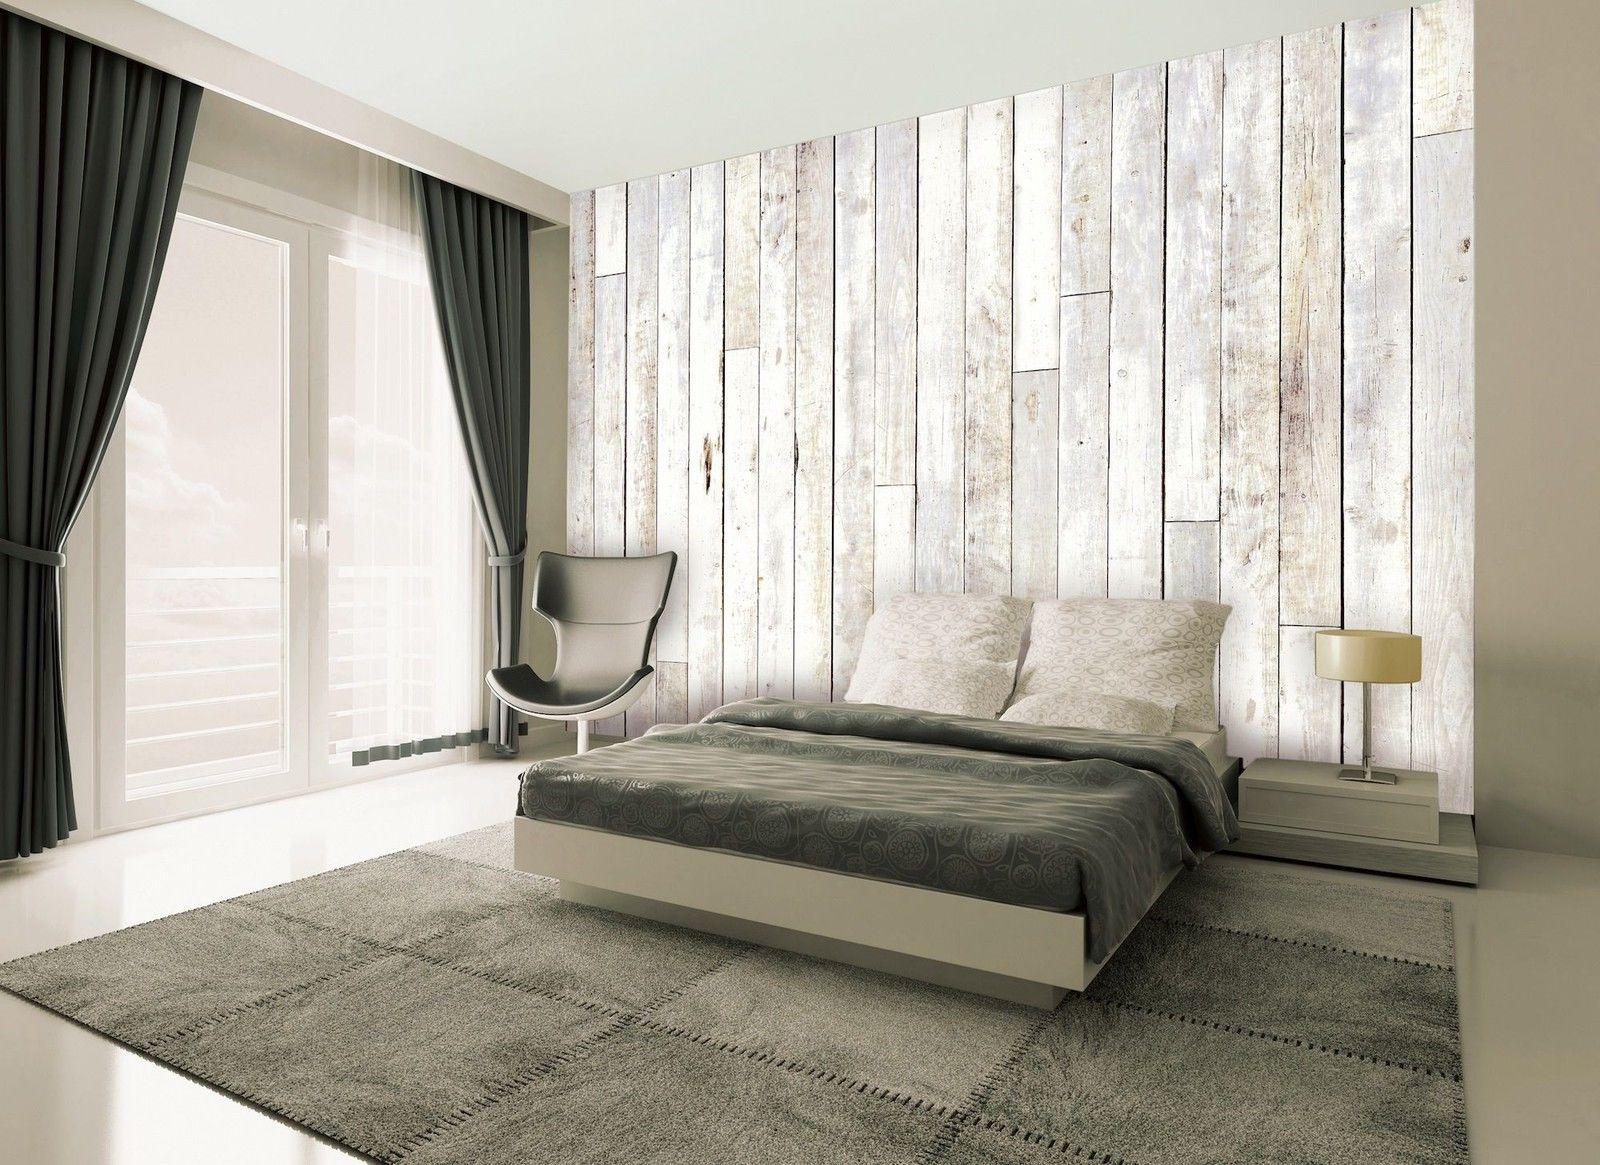 £40 1WALL Distressed Wood Panel Wall Mural. eBay